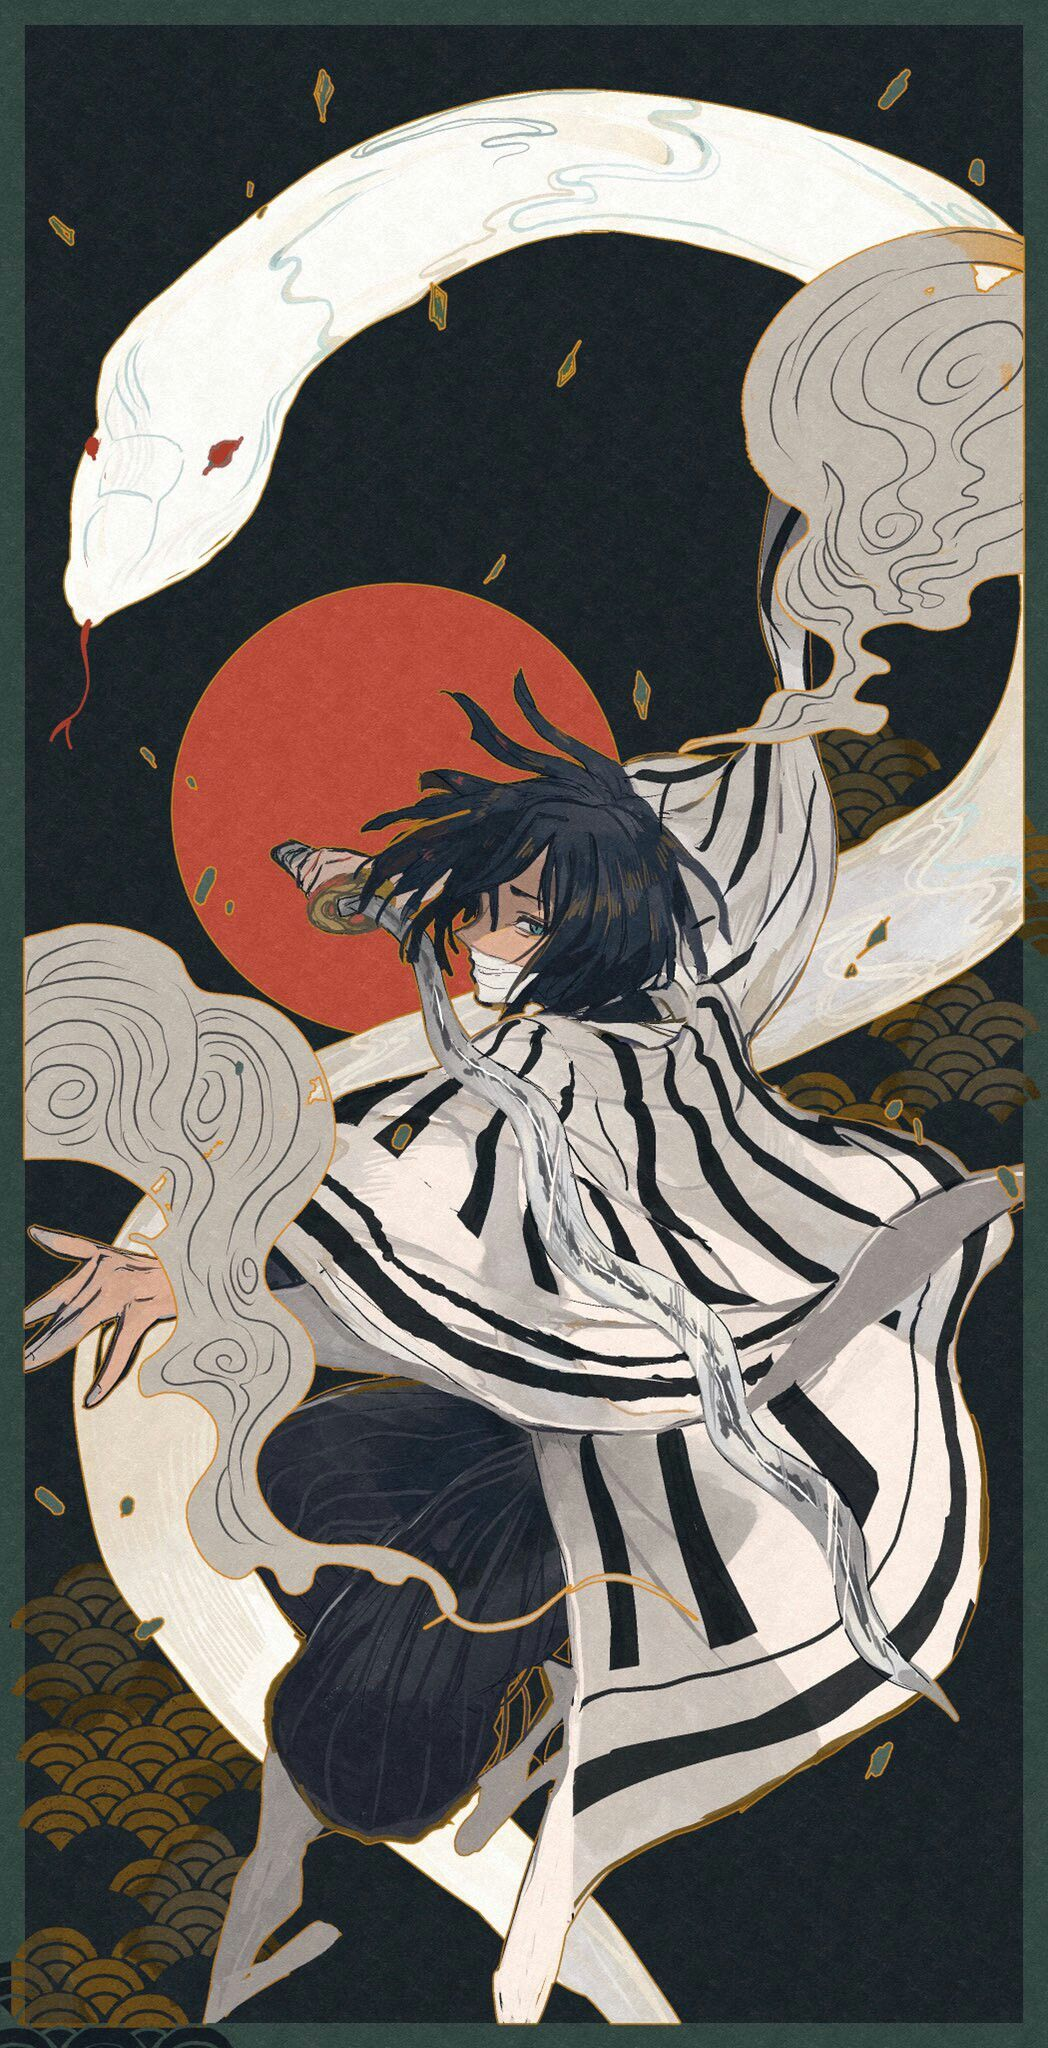 Pin By Peterpan Neverland On Kimetsu No Yaiba In 2020 Anime Demon Anime Slayer Anime